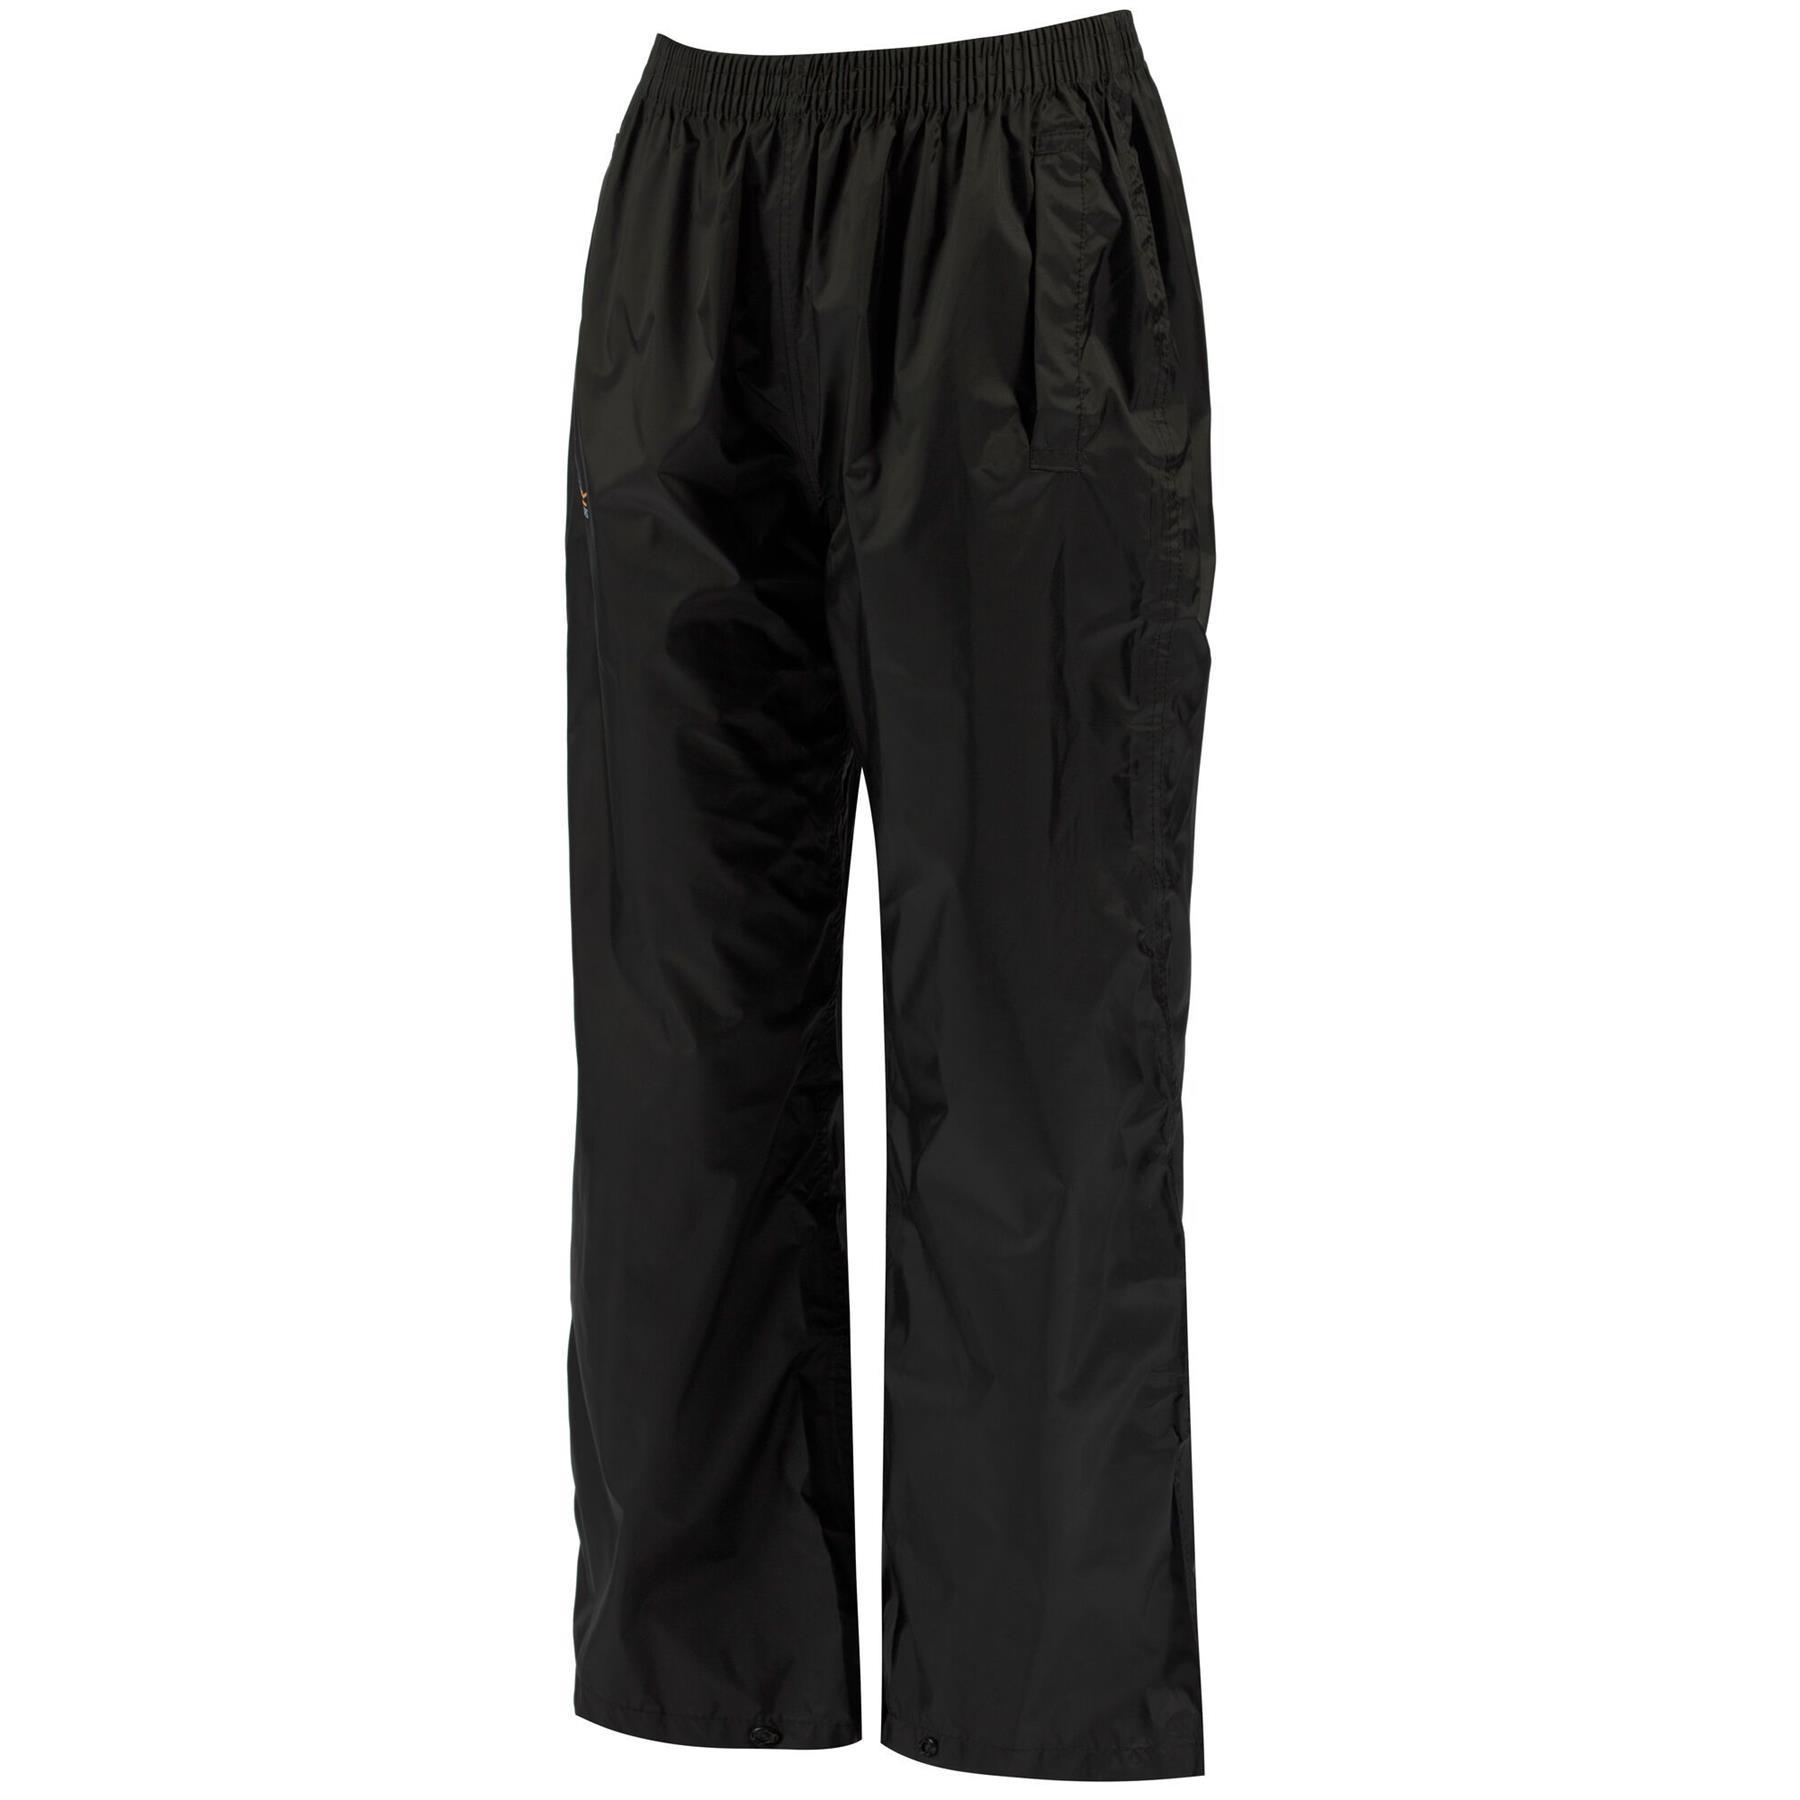 miniatuur 6 - Regatta Kids Pack It Waterproof Packable Overtrousers Boys Girls Trousers